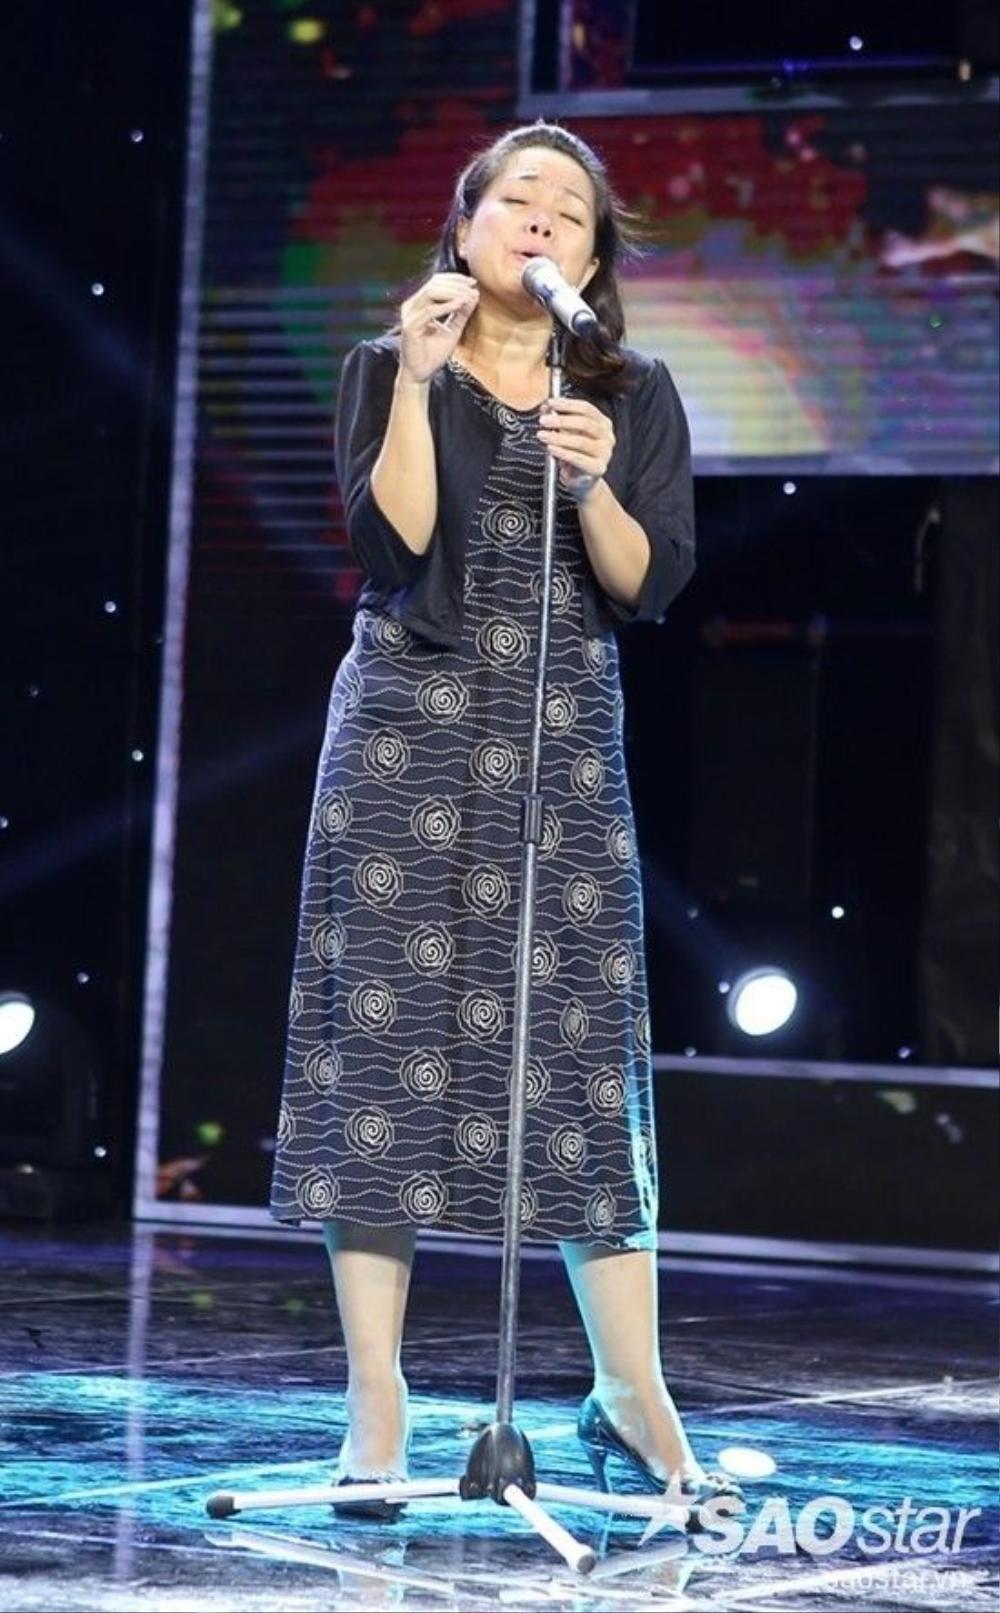 MinhThao